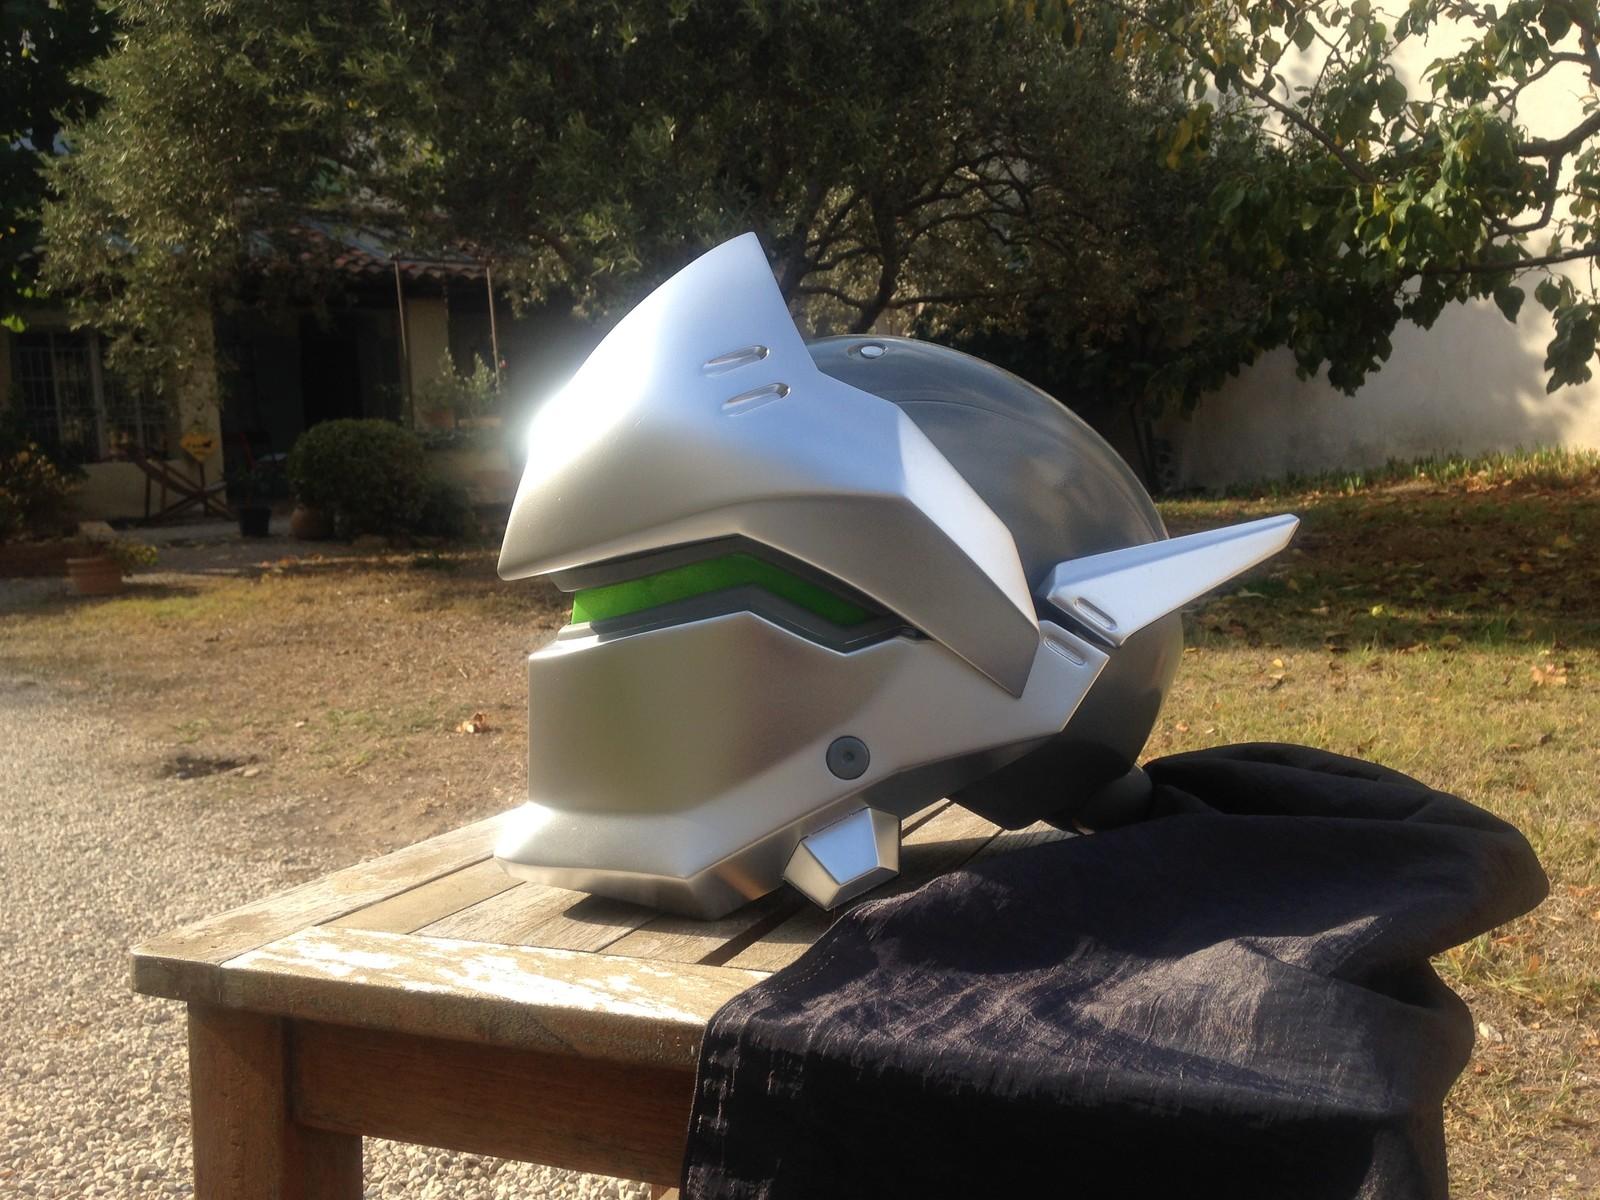 Genji's helmet